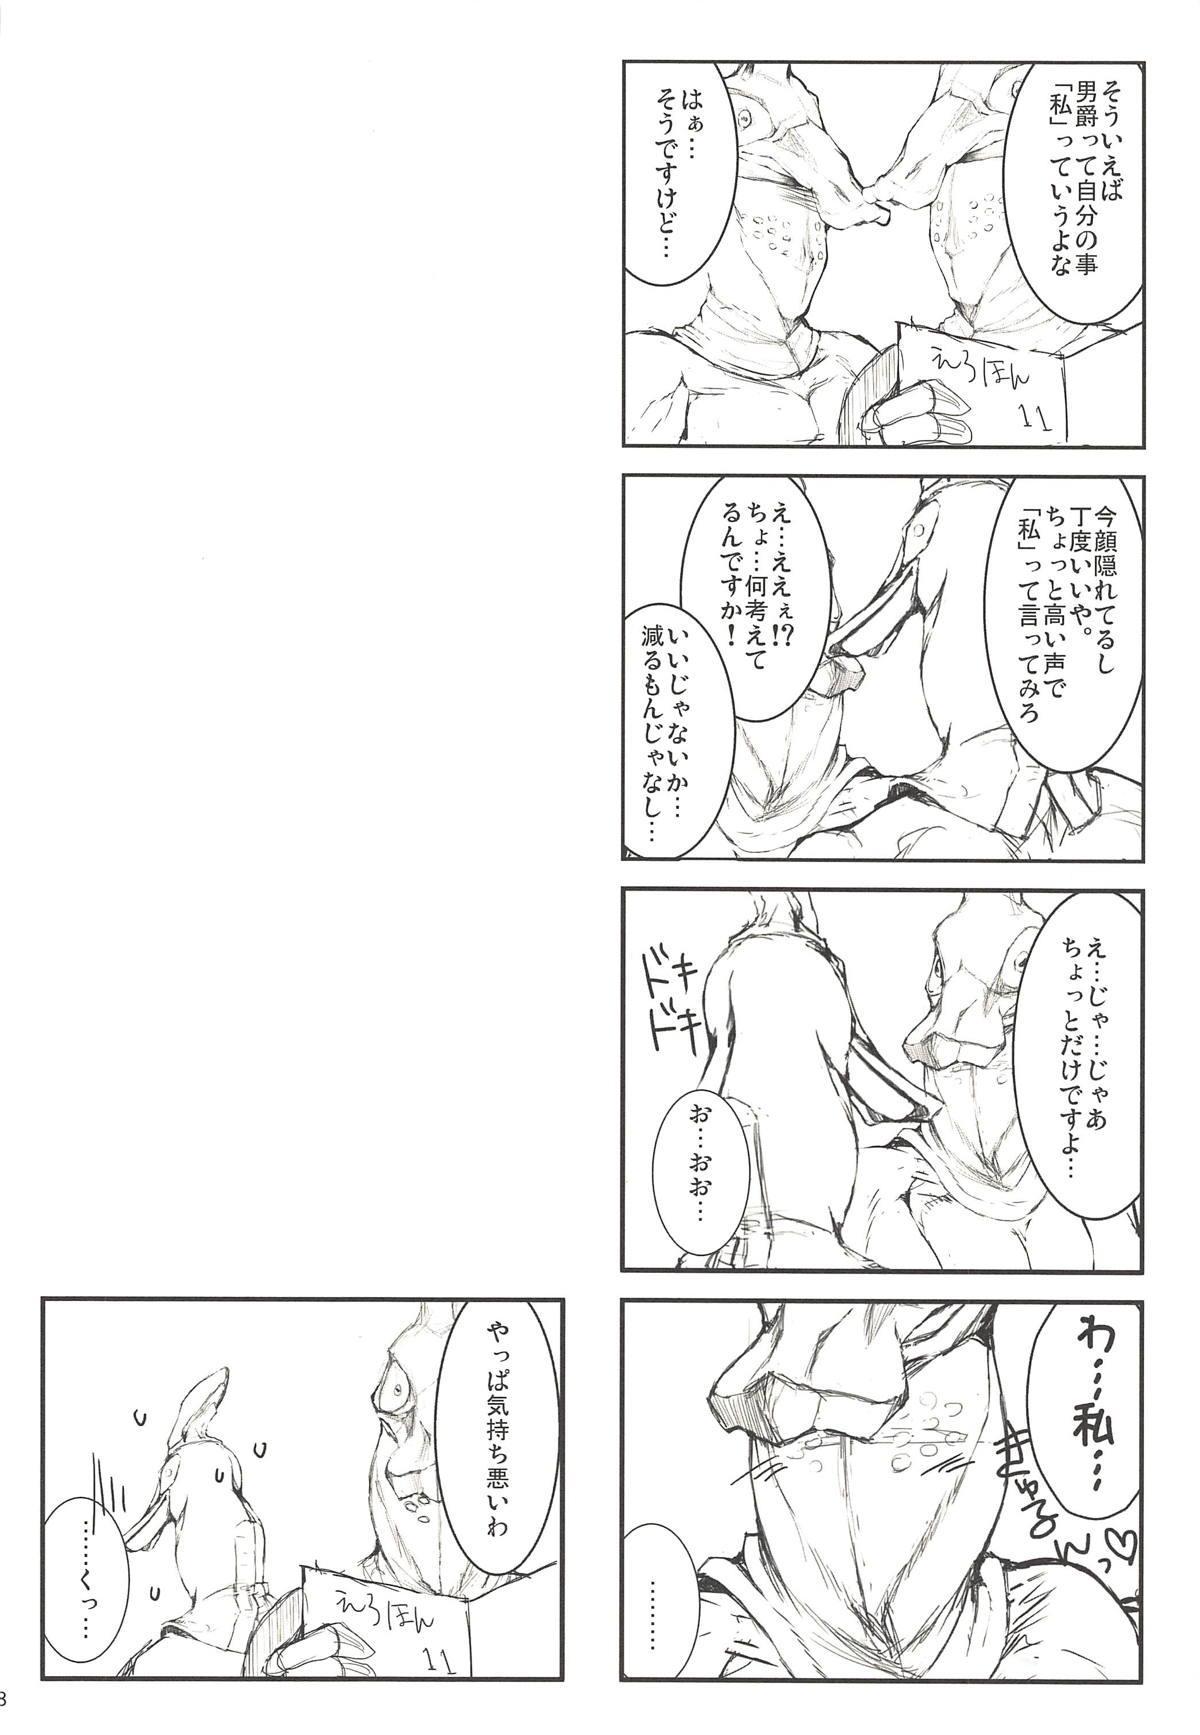 Monhan no Erohon G3 11→14+Juuhi+Omakebon Soushuuhen 56